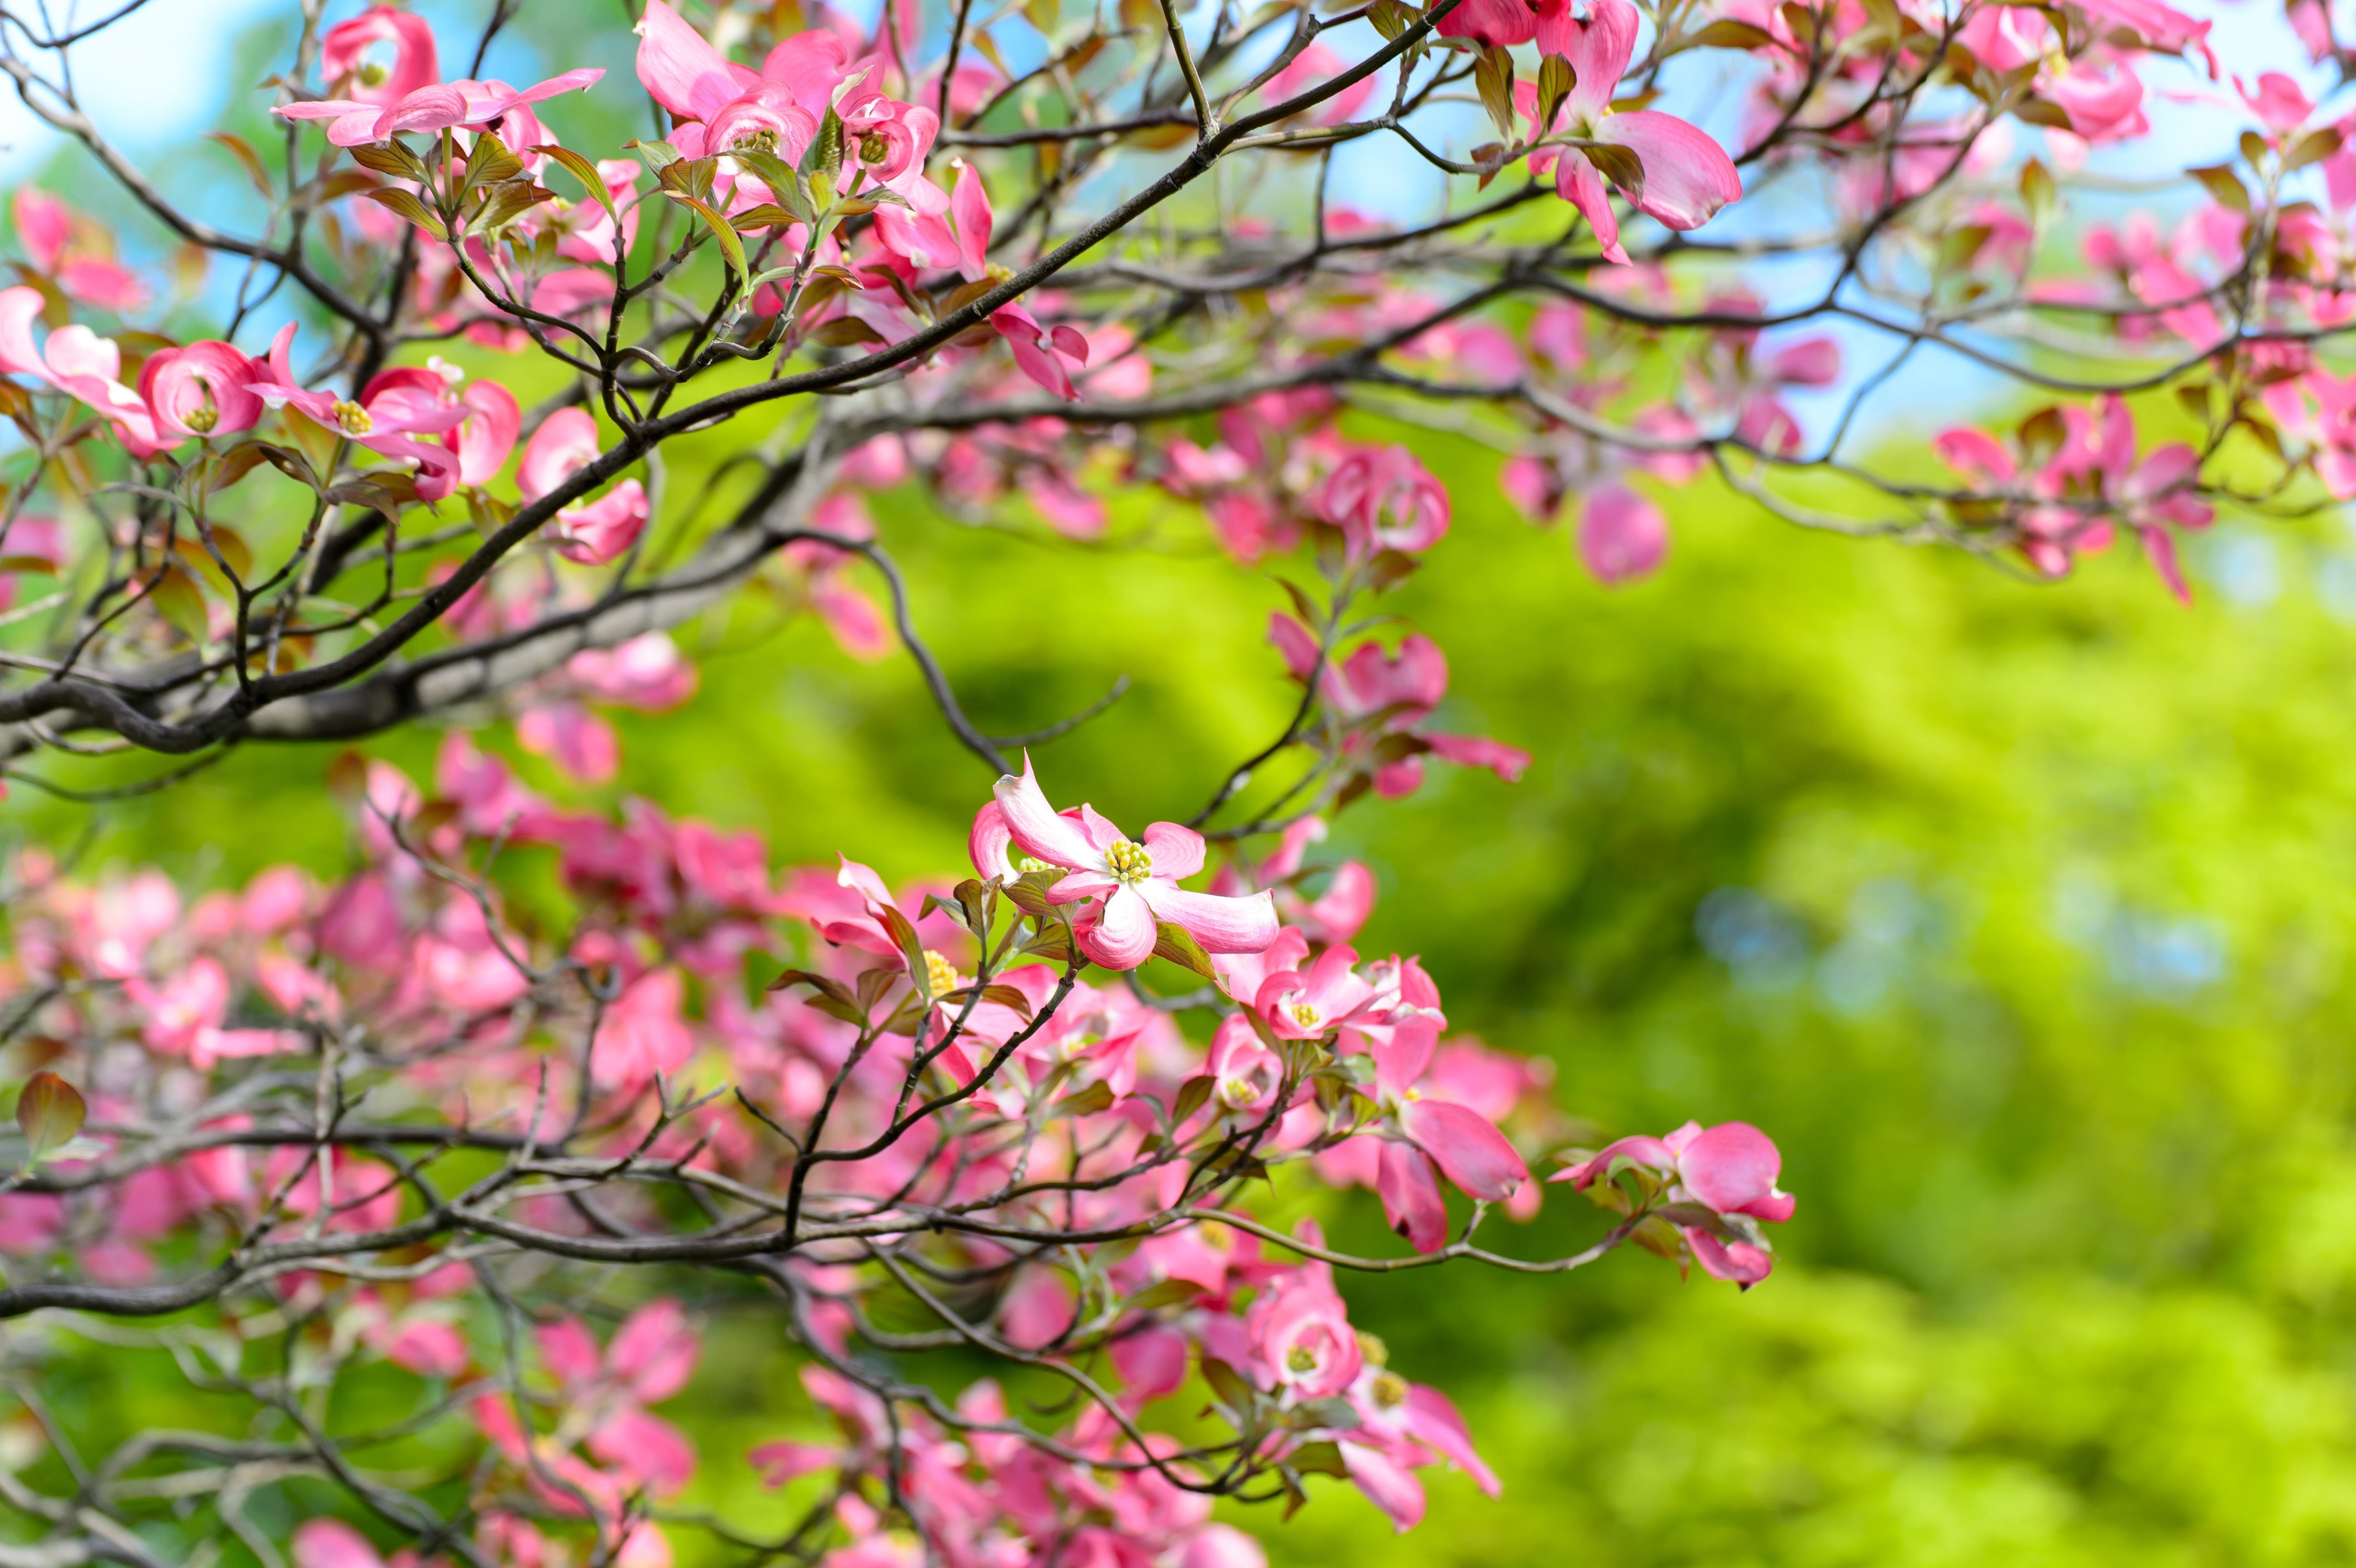 Free landscape tree branch sky leaf flower petal